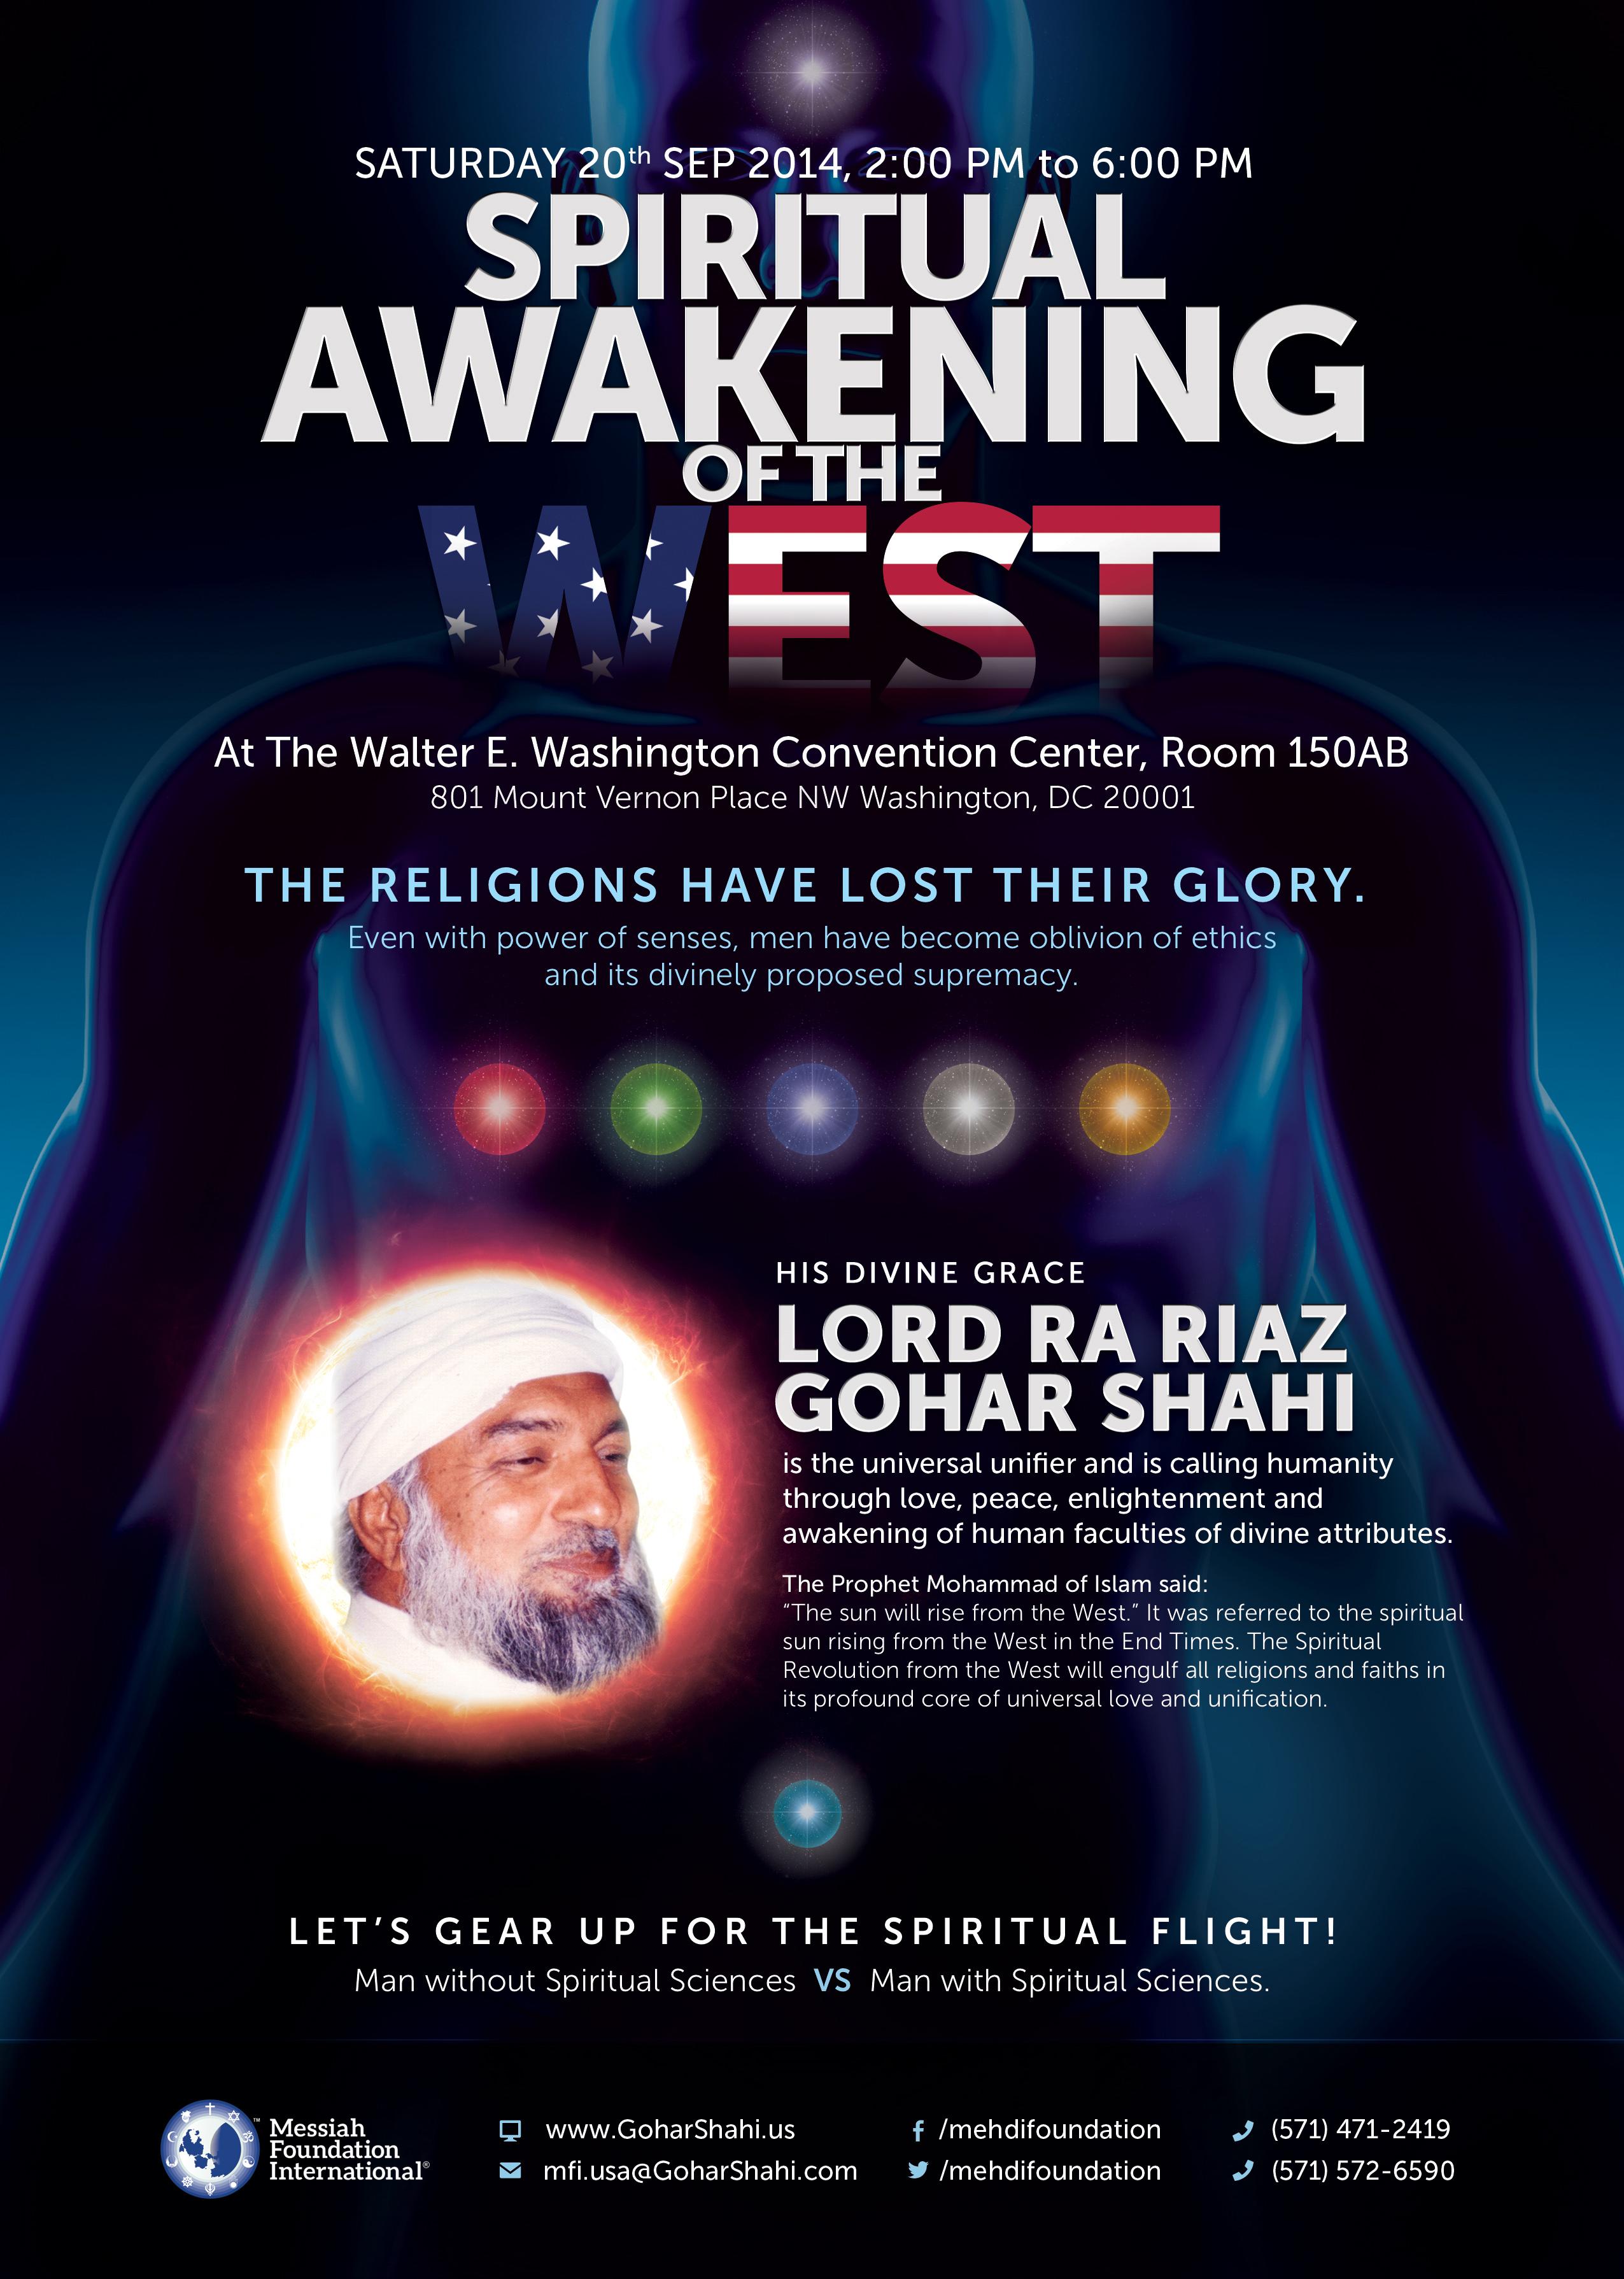 The Spiritual Awakening of the West Leaflet